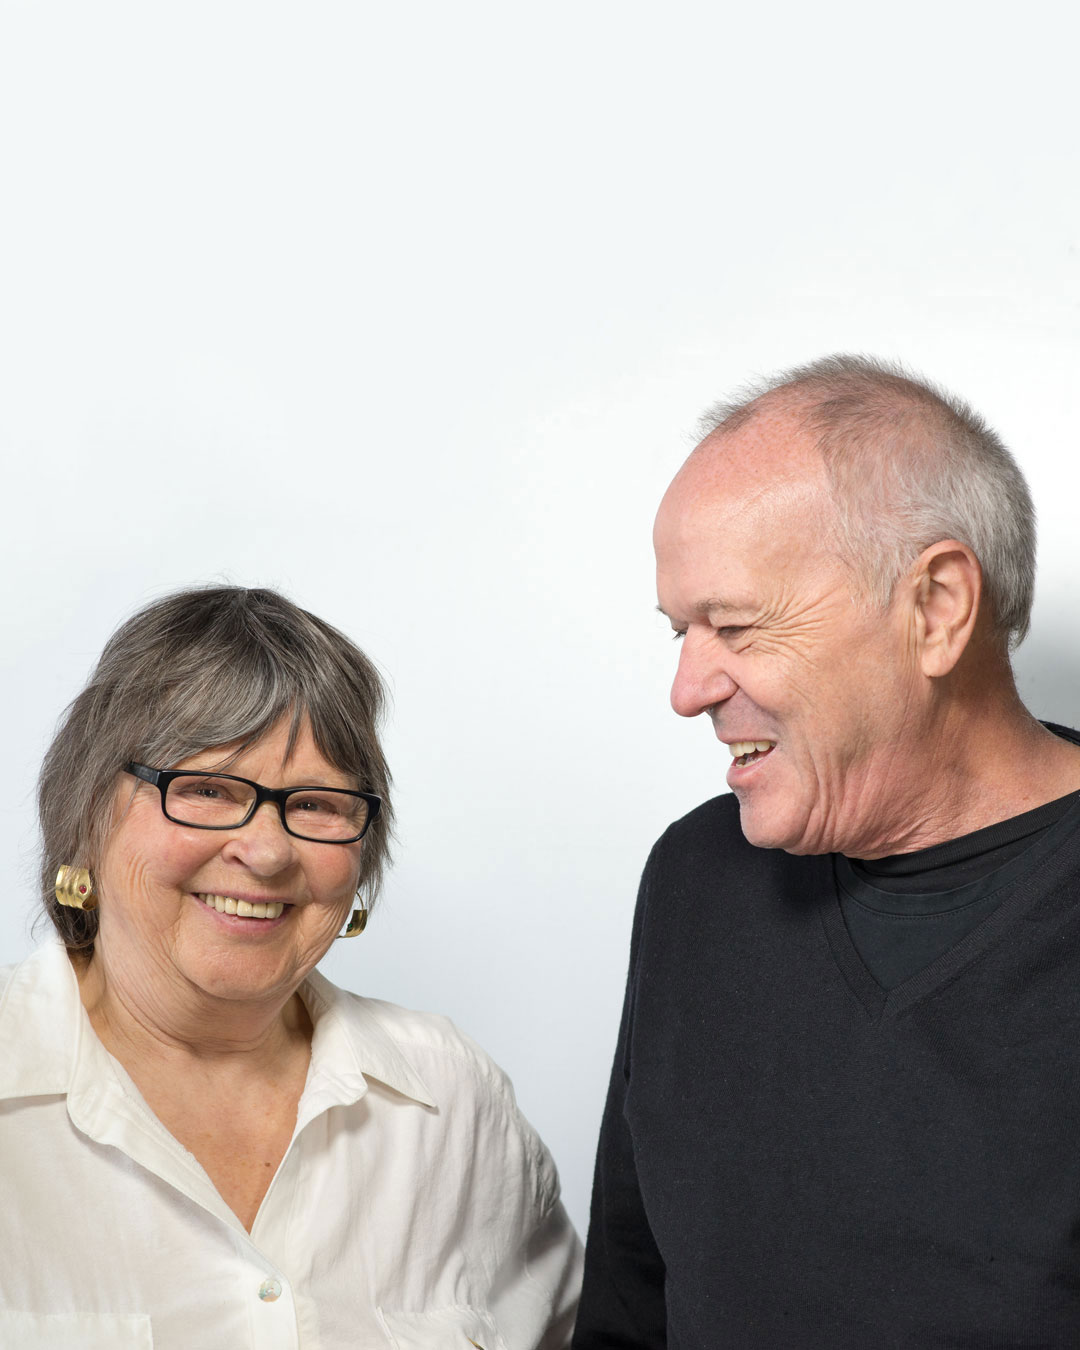 Dorothea Prühl and Otto Künzli